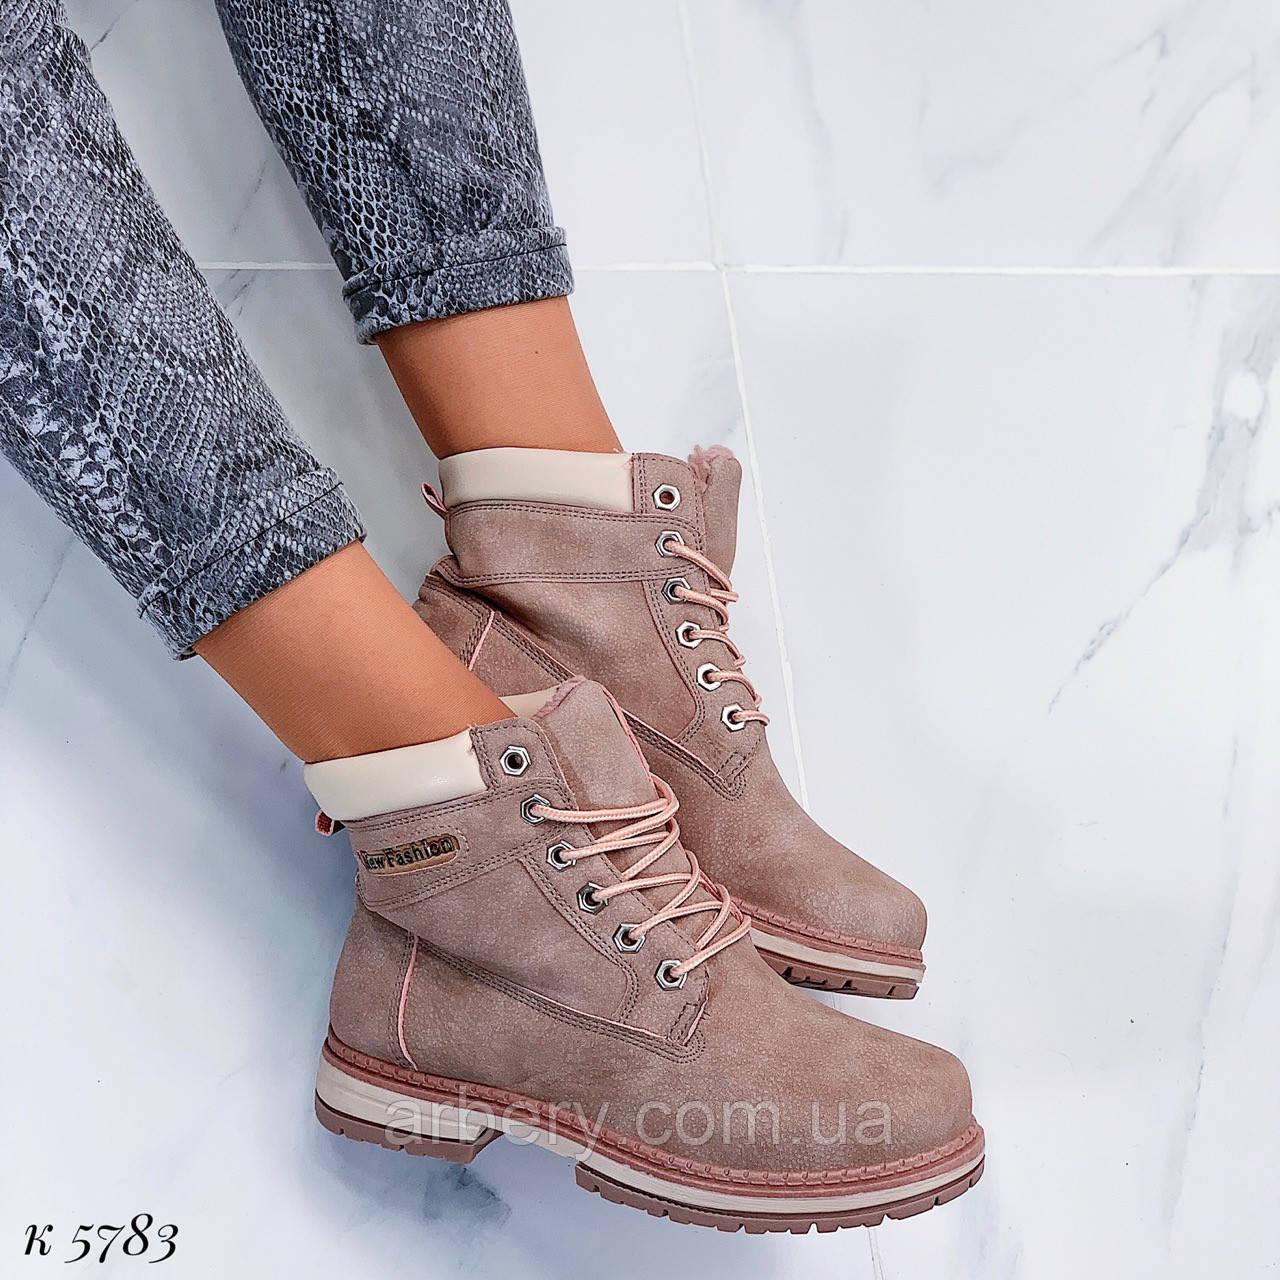 Женские зимние ботинки в стилеТимберленд